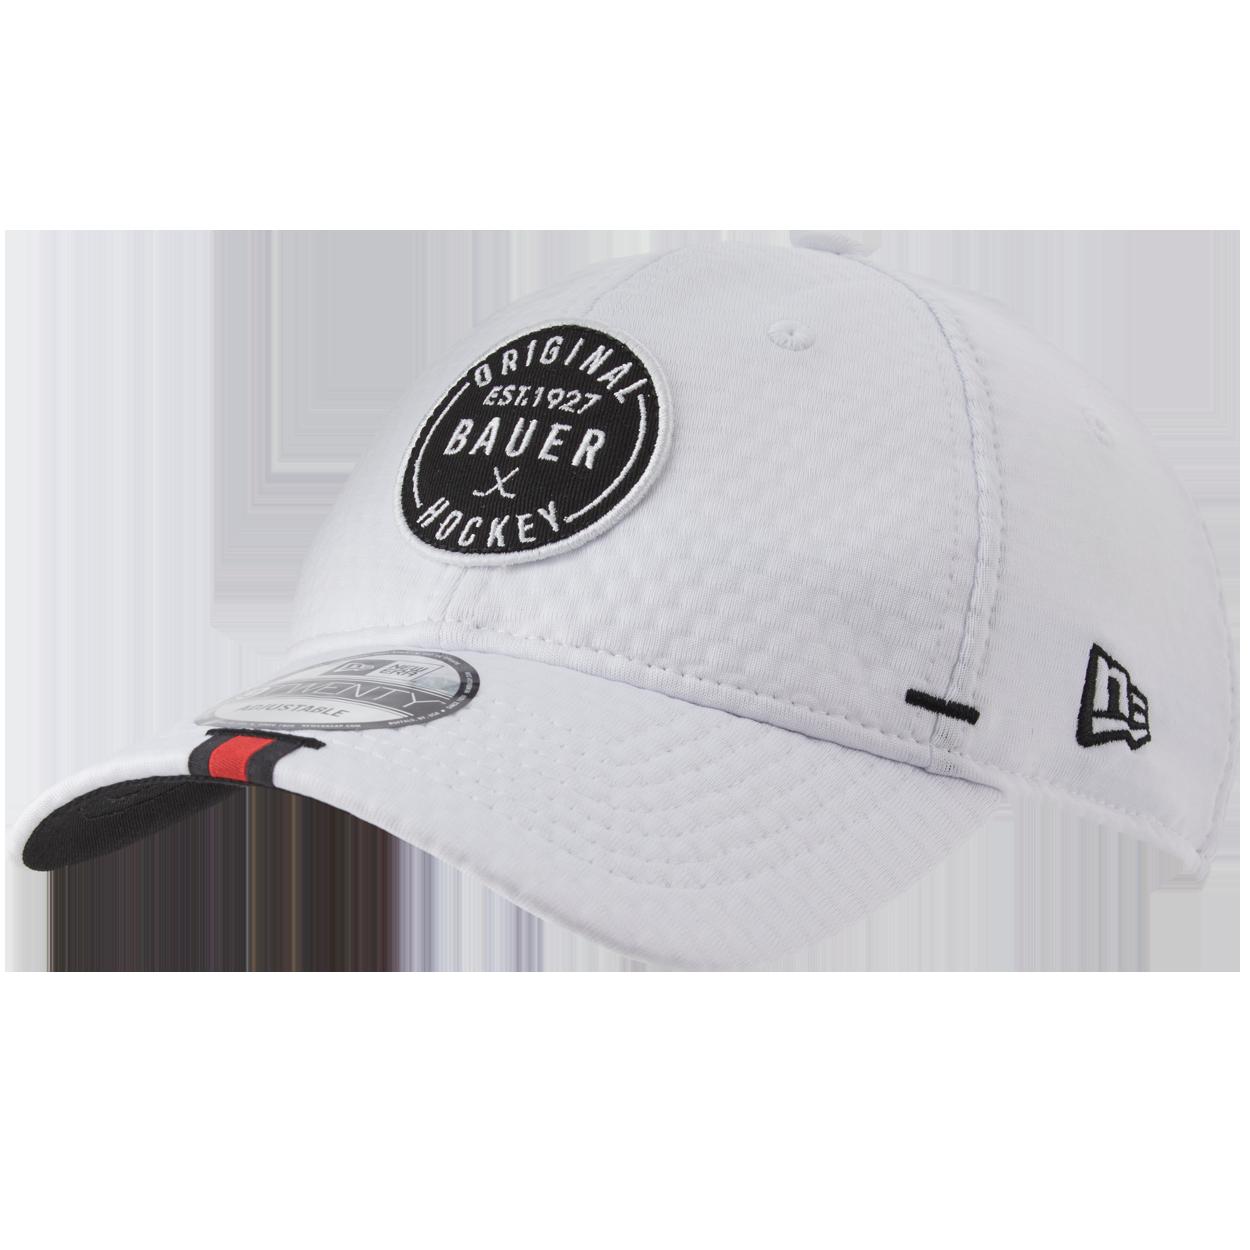 New Era Adjustable Golf Hat